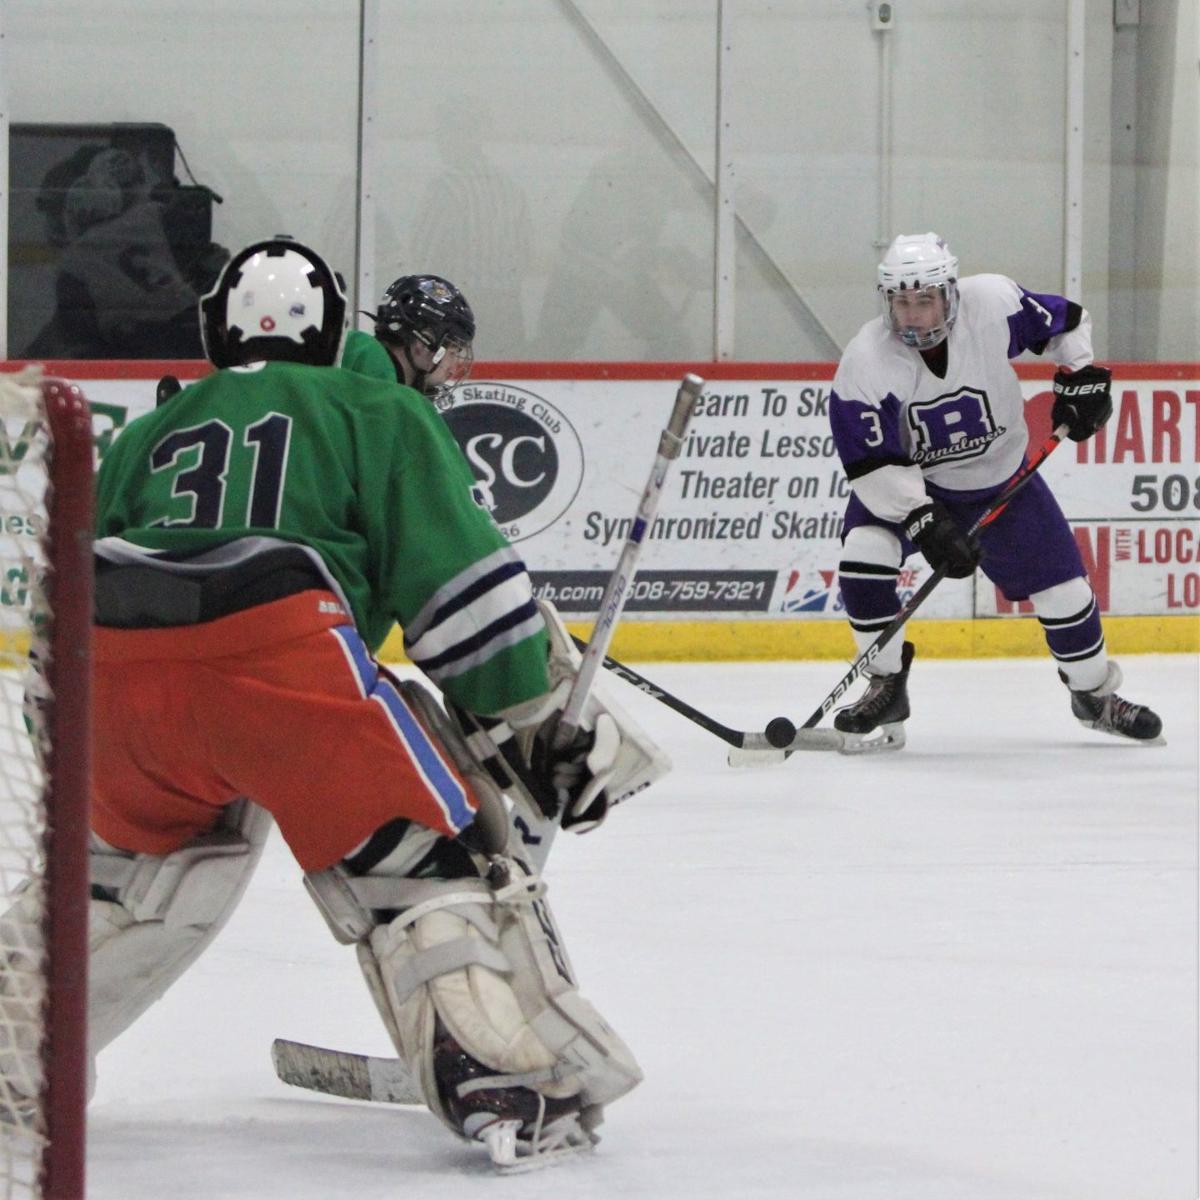 Bourne Boys' Hockey vs Dighton-Rehoboth/Seekonk — December 28, 2019